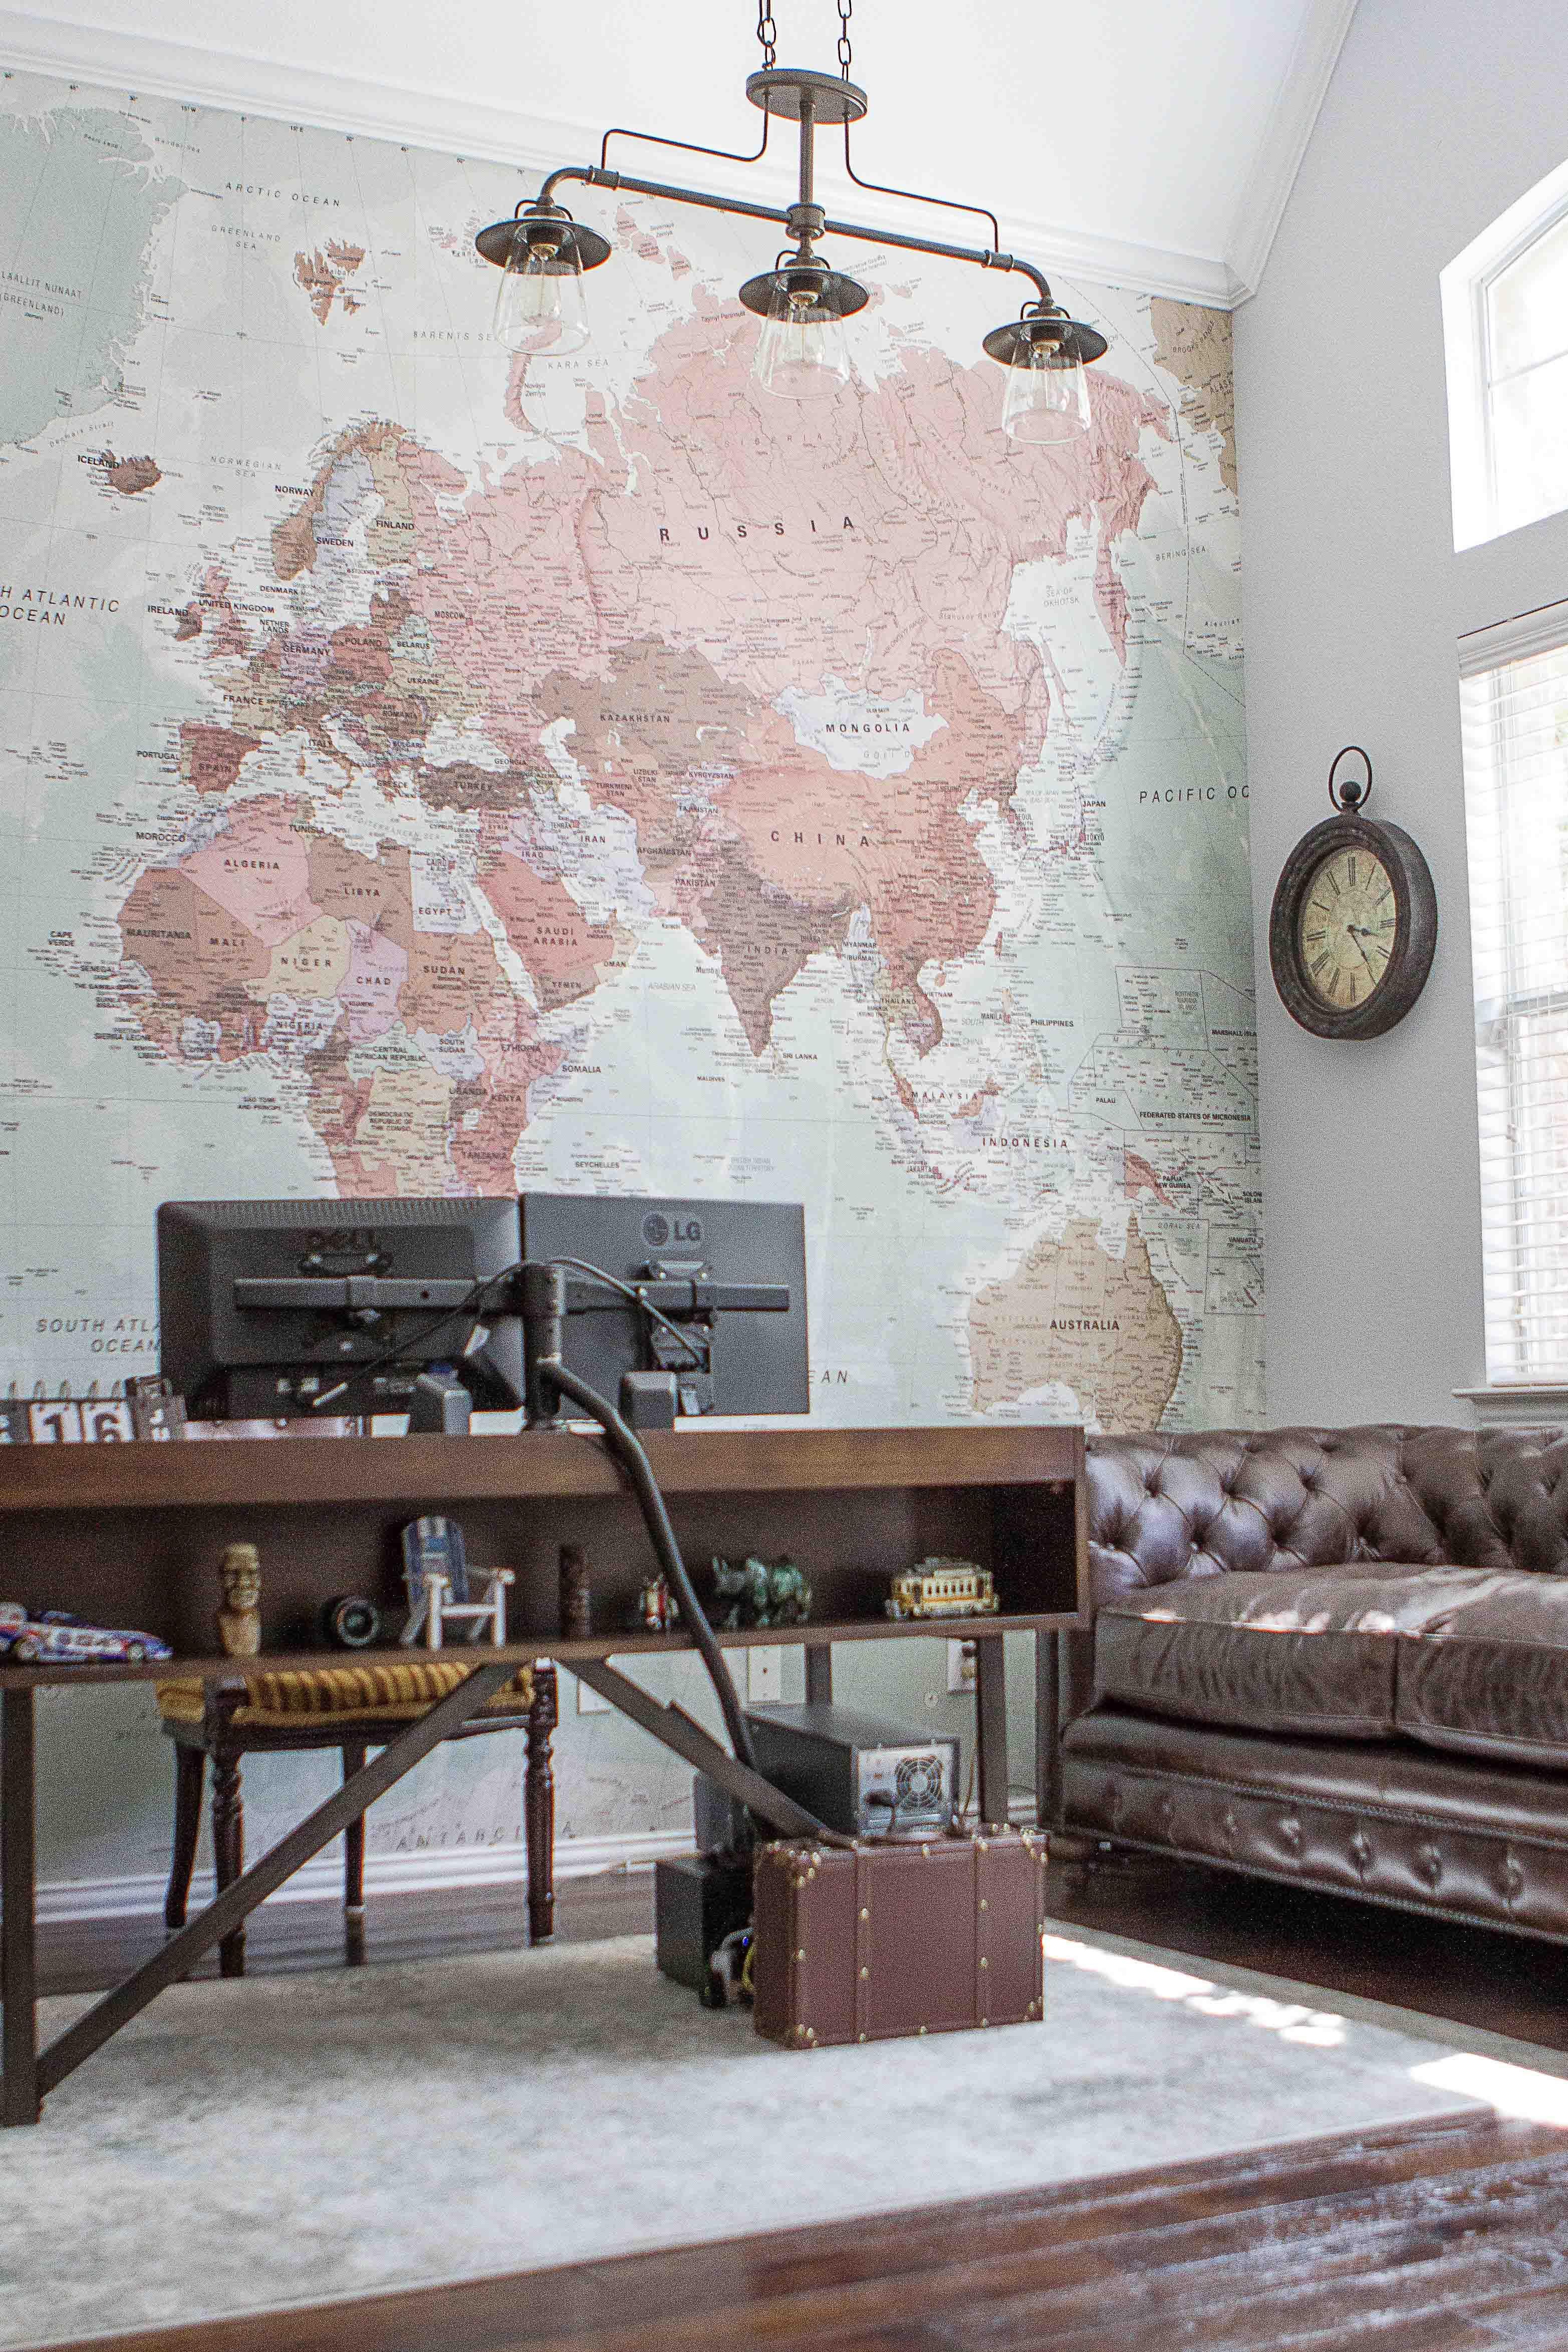 Classic World Map Wallpaper | Stylish Map Mural | MuralsWallpaper #worldmapmural